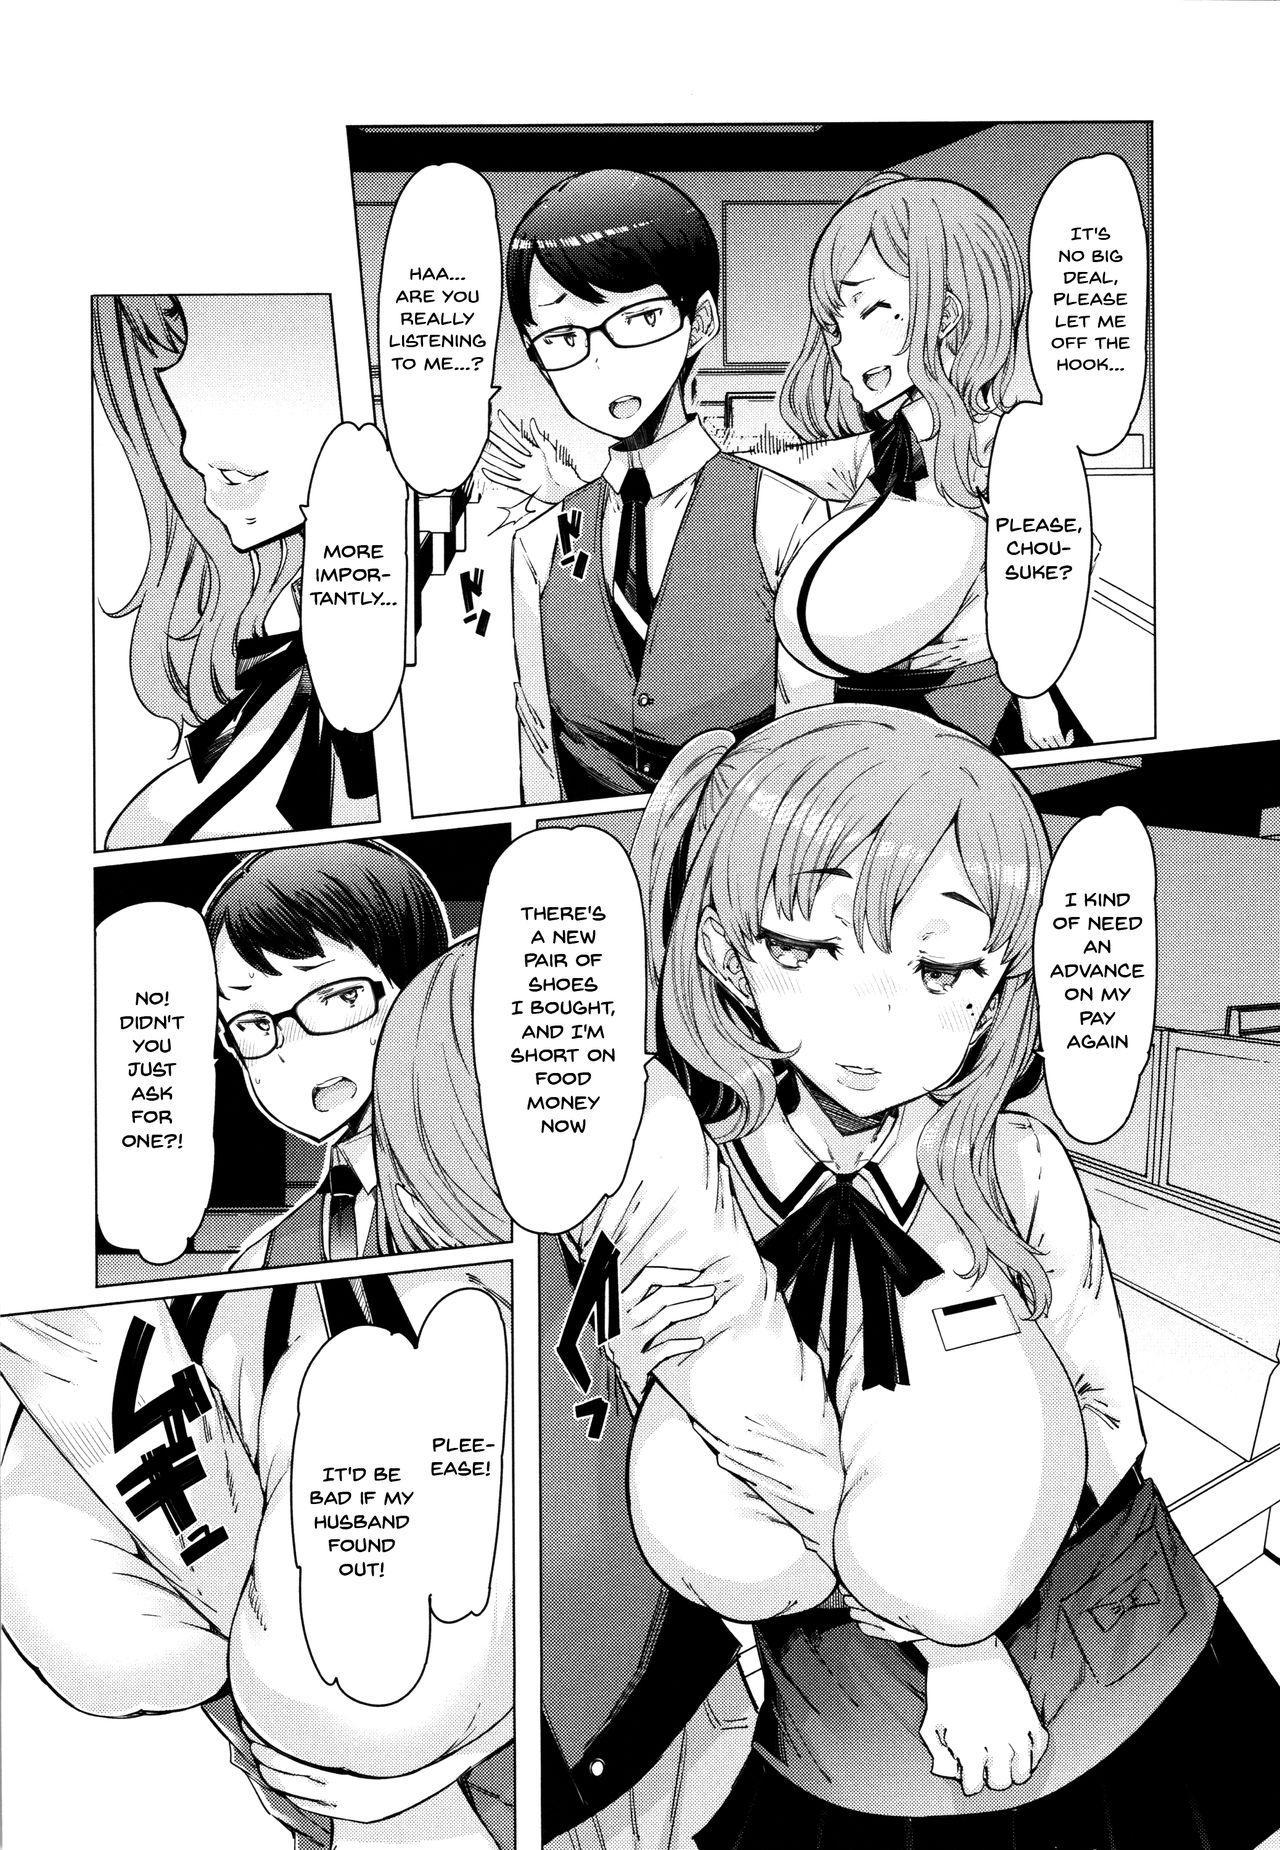 Hitozuma ga Ero Sugite Shigoto ni Naranai! | These Housewives Are Too Lewd I Can't Help It! Ch.1-3 7